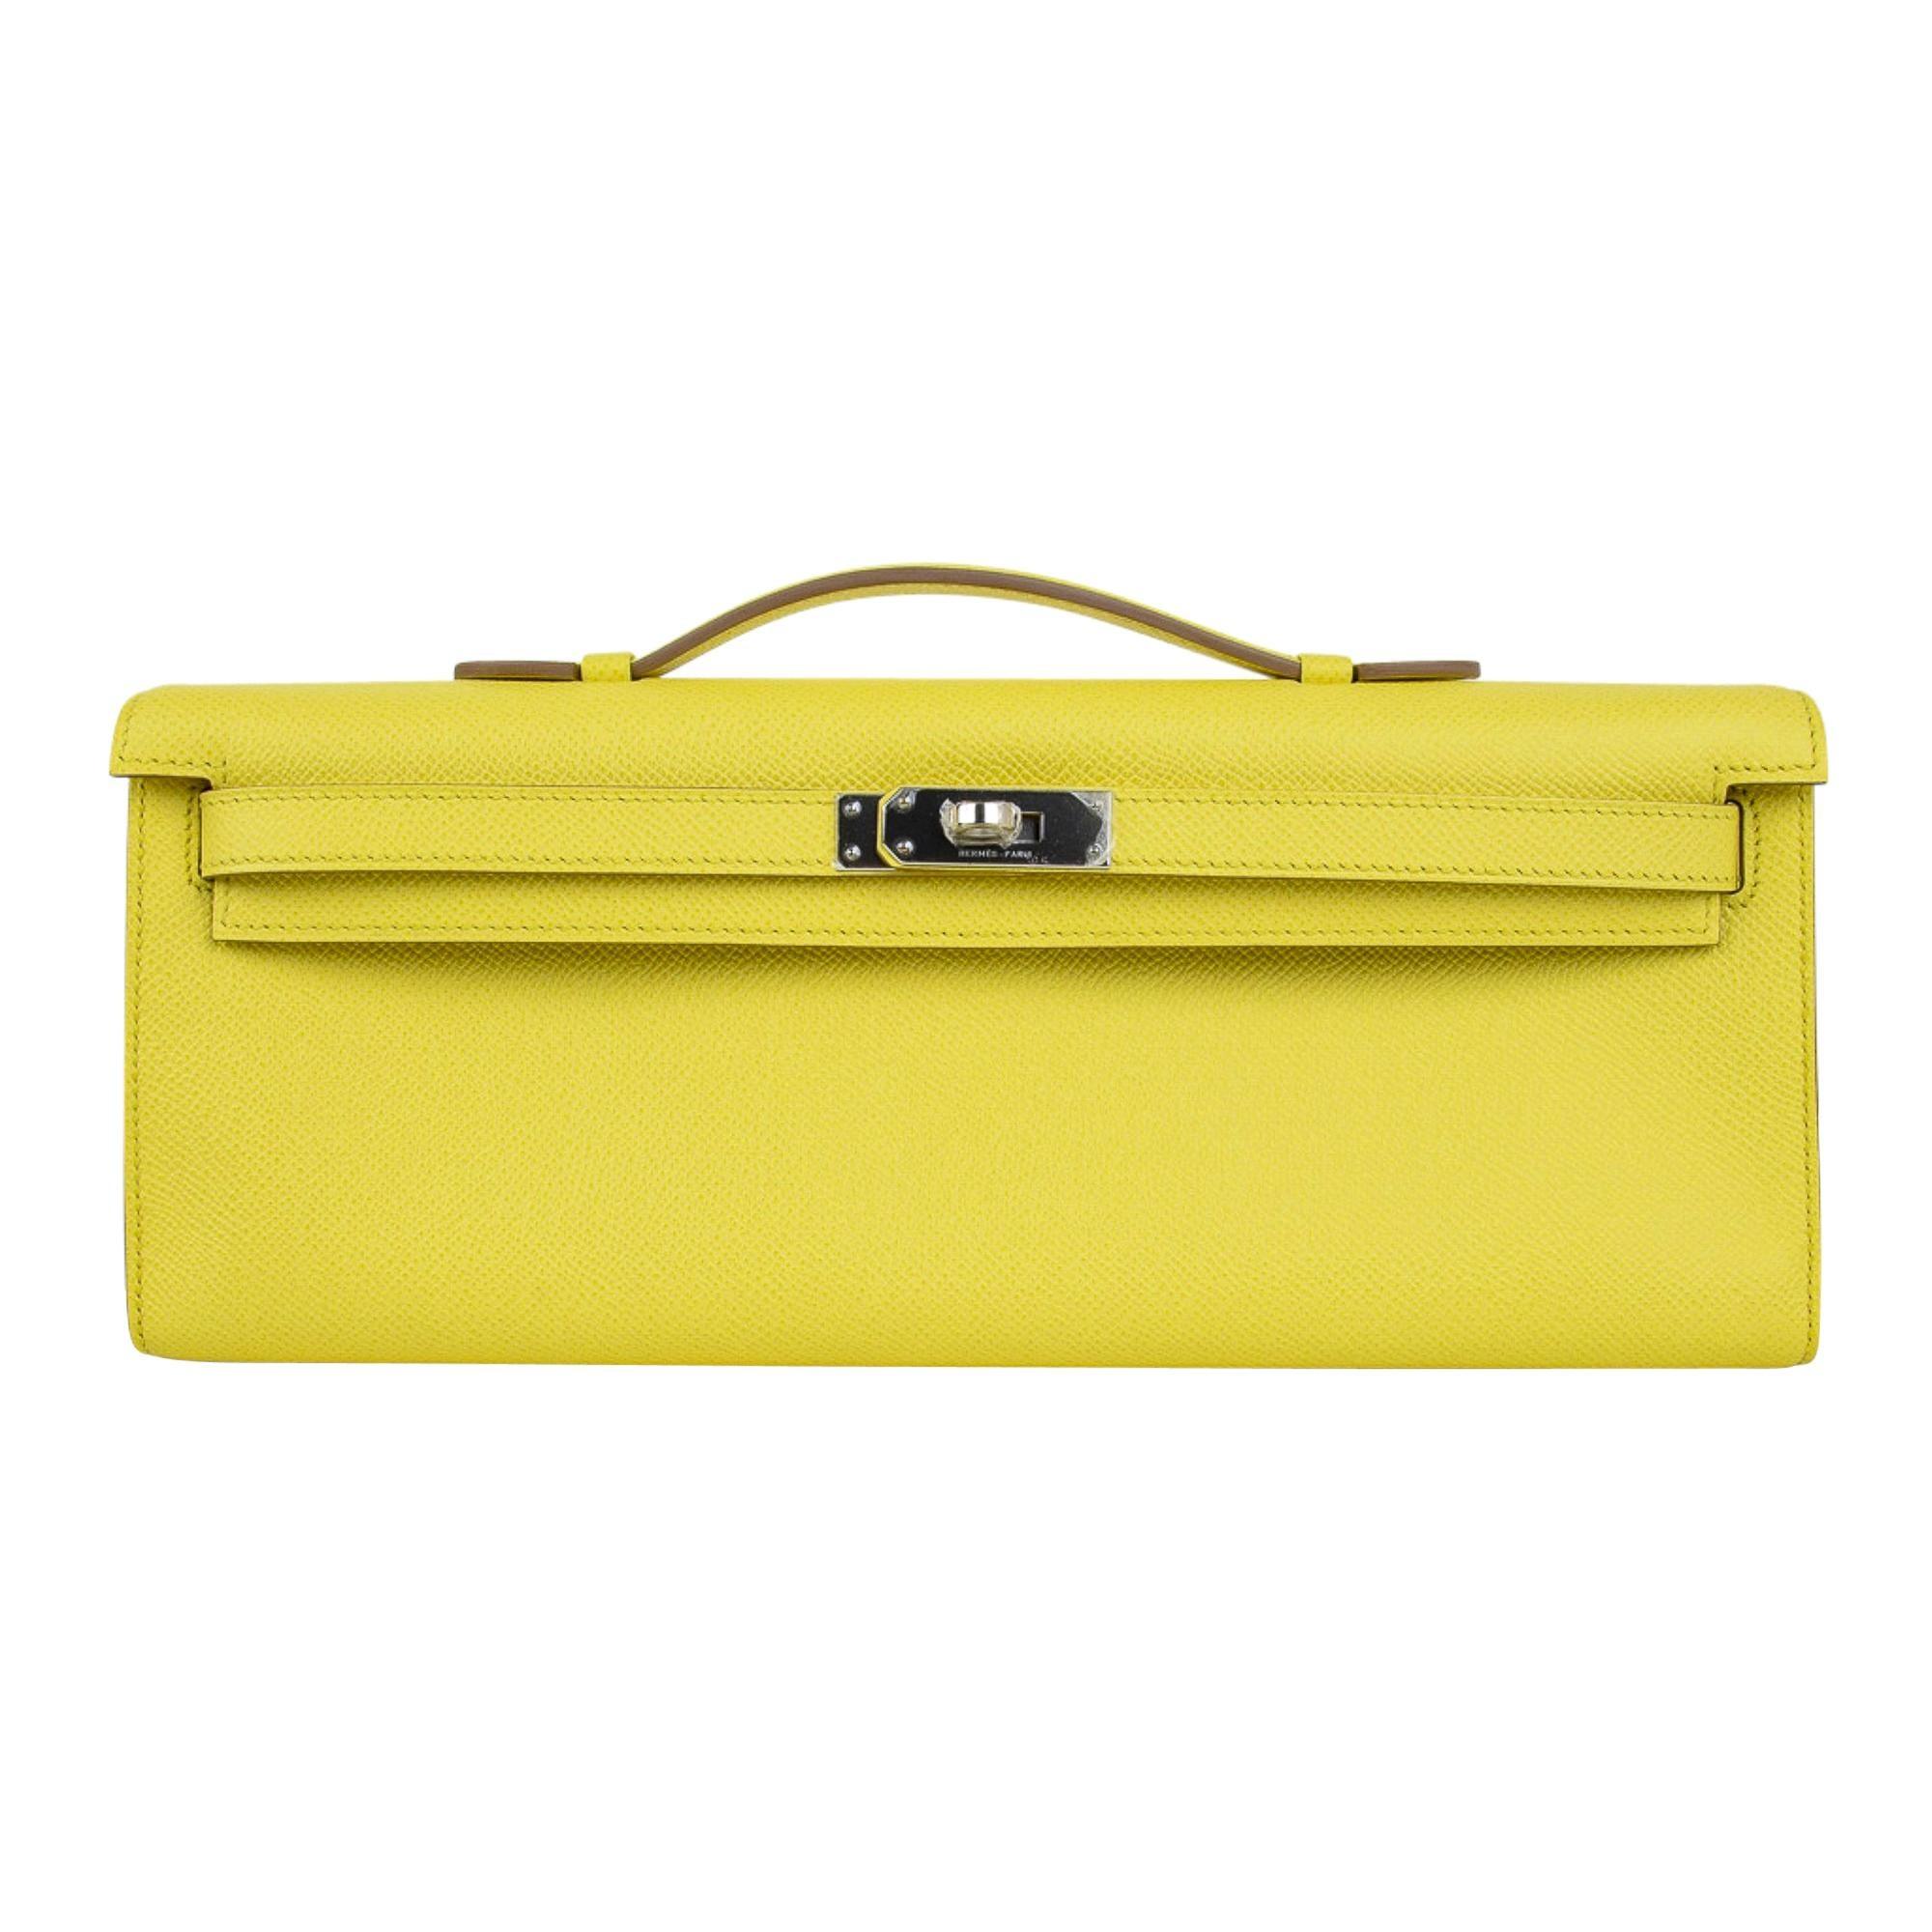 Hermes Kelly Cut Clutch Bag Fresh Souffre Yellow Epsom Palladium Rare New w/Box